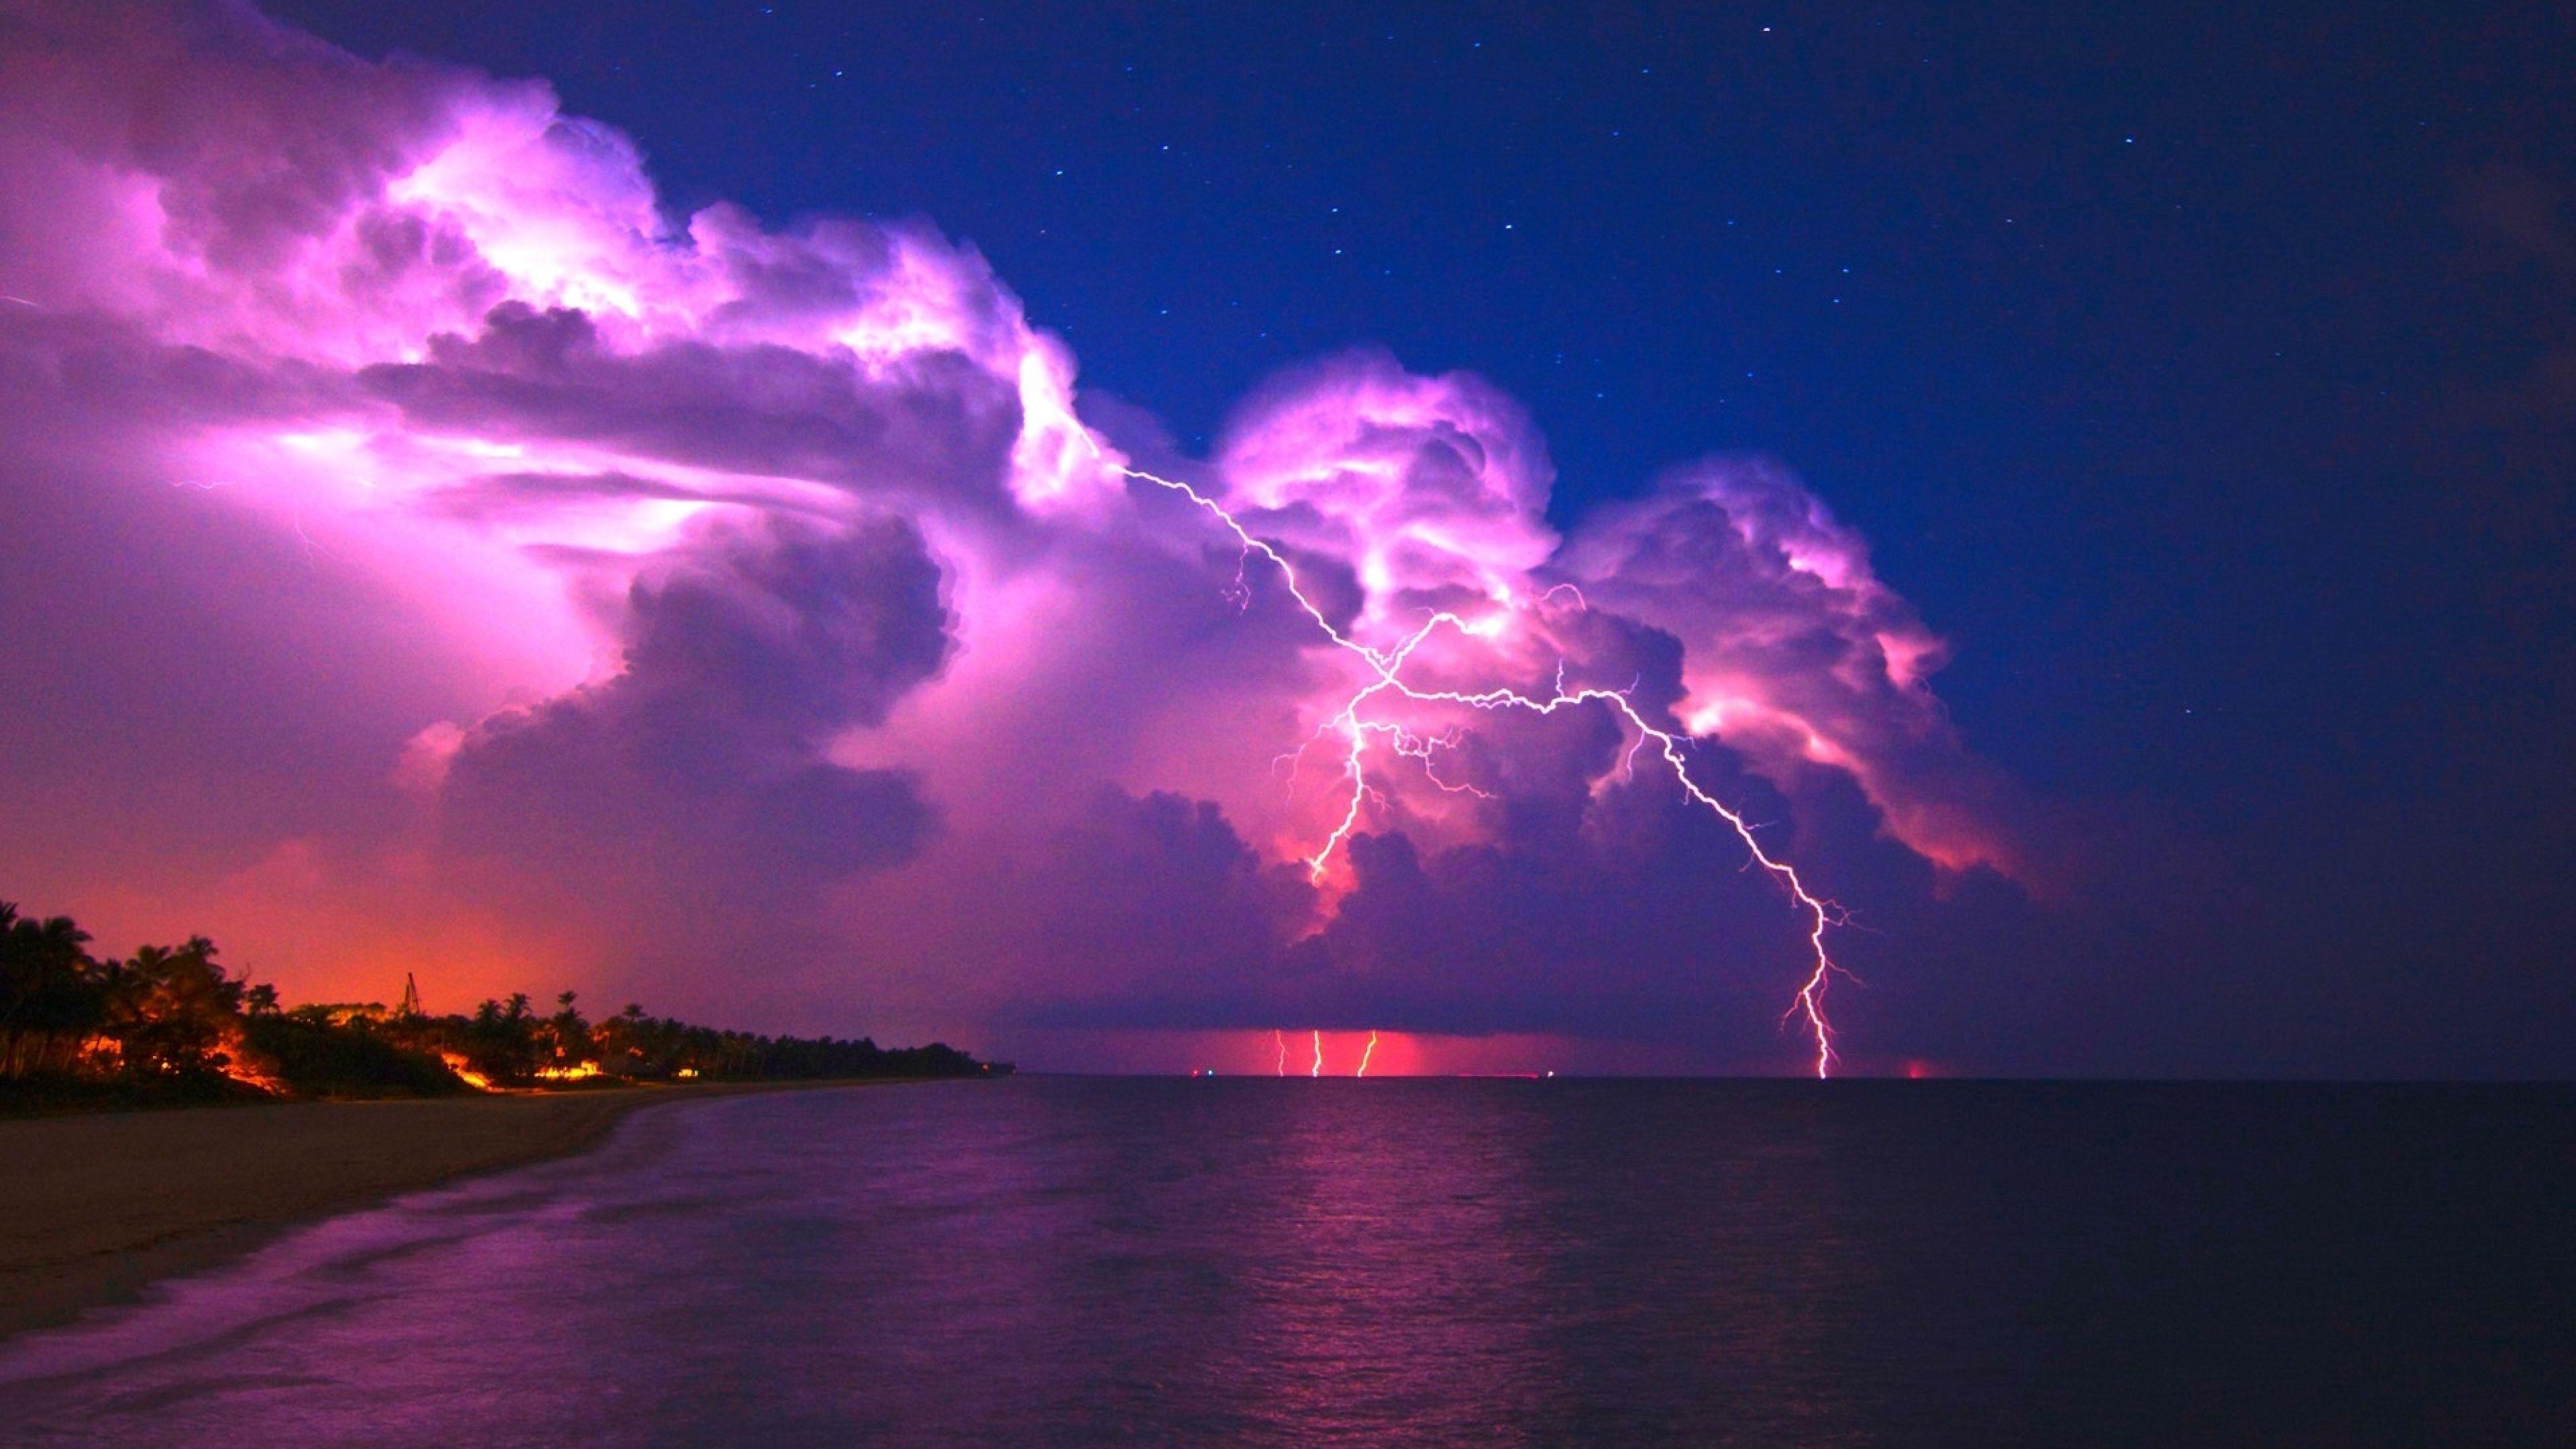 Download Wallpaper 3840x2160 Lightning Elements Coast Night Stars Clouds Clearly Sky 4k Ultra Hd Hd Background Clouds Storm Wallpaper Lightning Storm